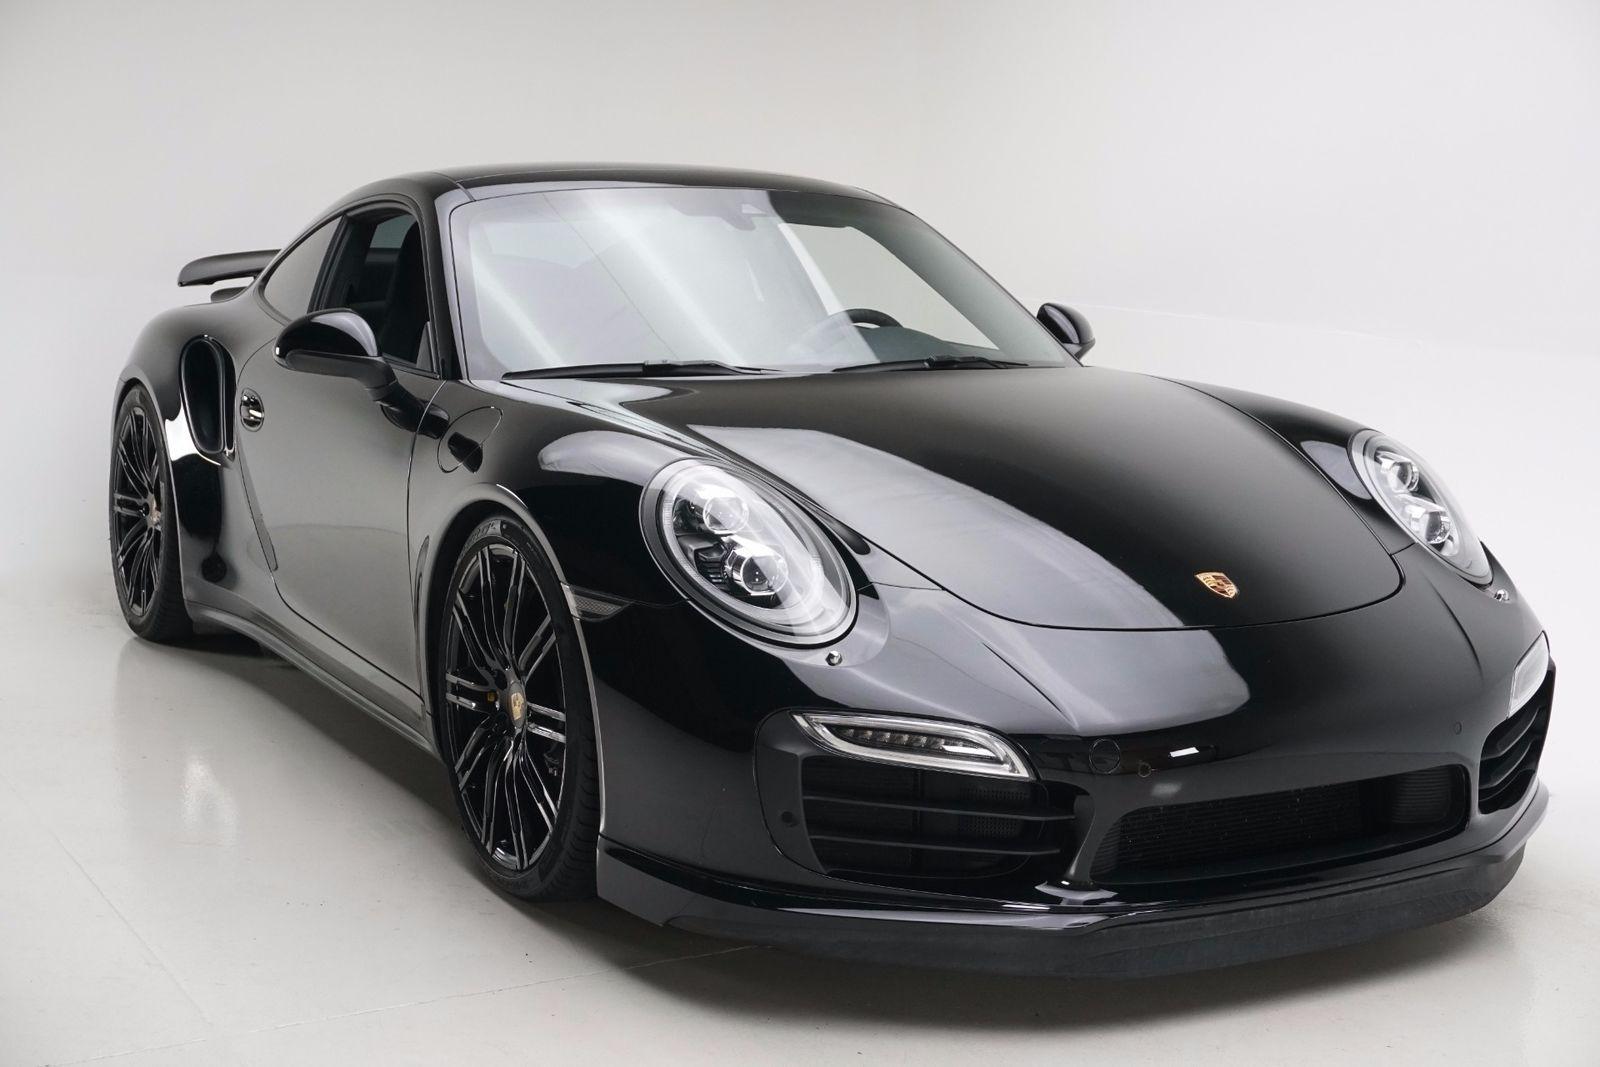 amazing 2014 porsche 911 turbo s 2014 porsche 911 turbo s 2017 2018 24carshop. Black Bedroom Furniture Sets. Home Design Ideas